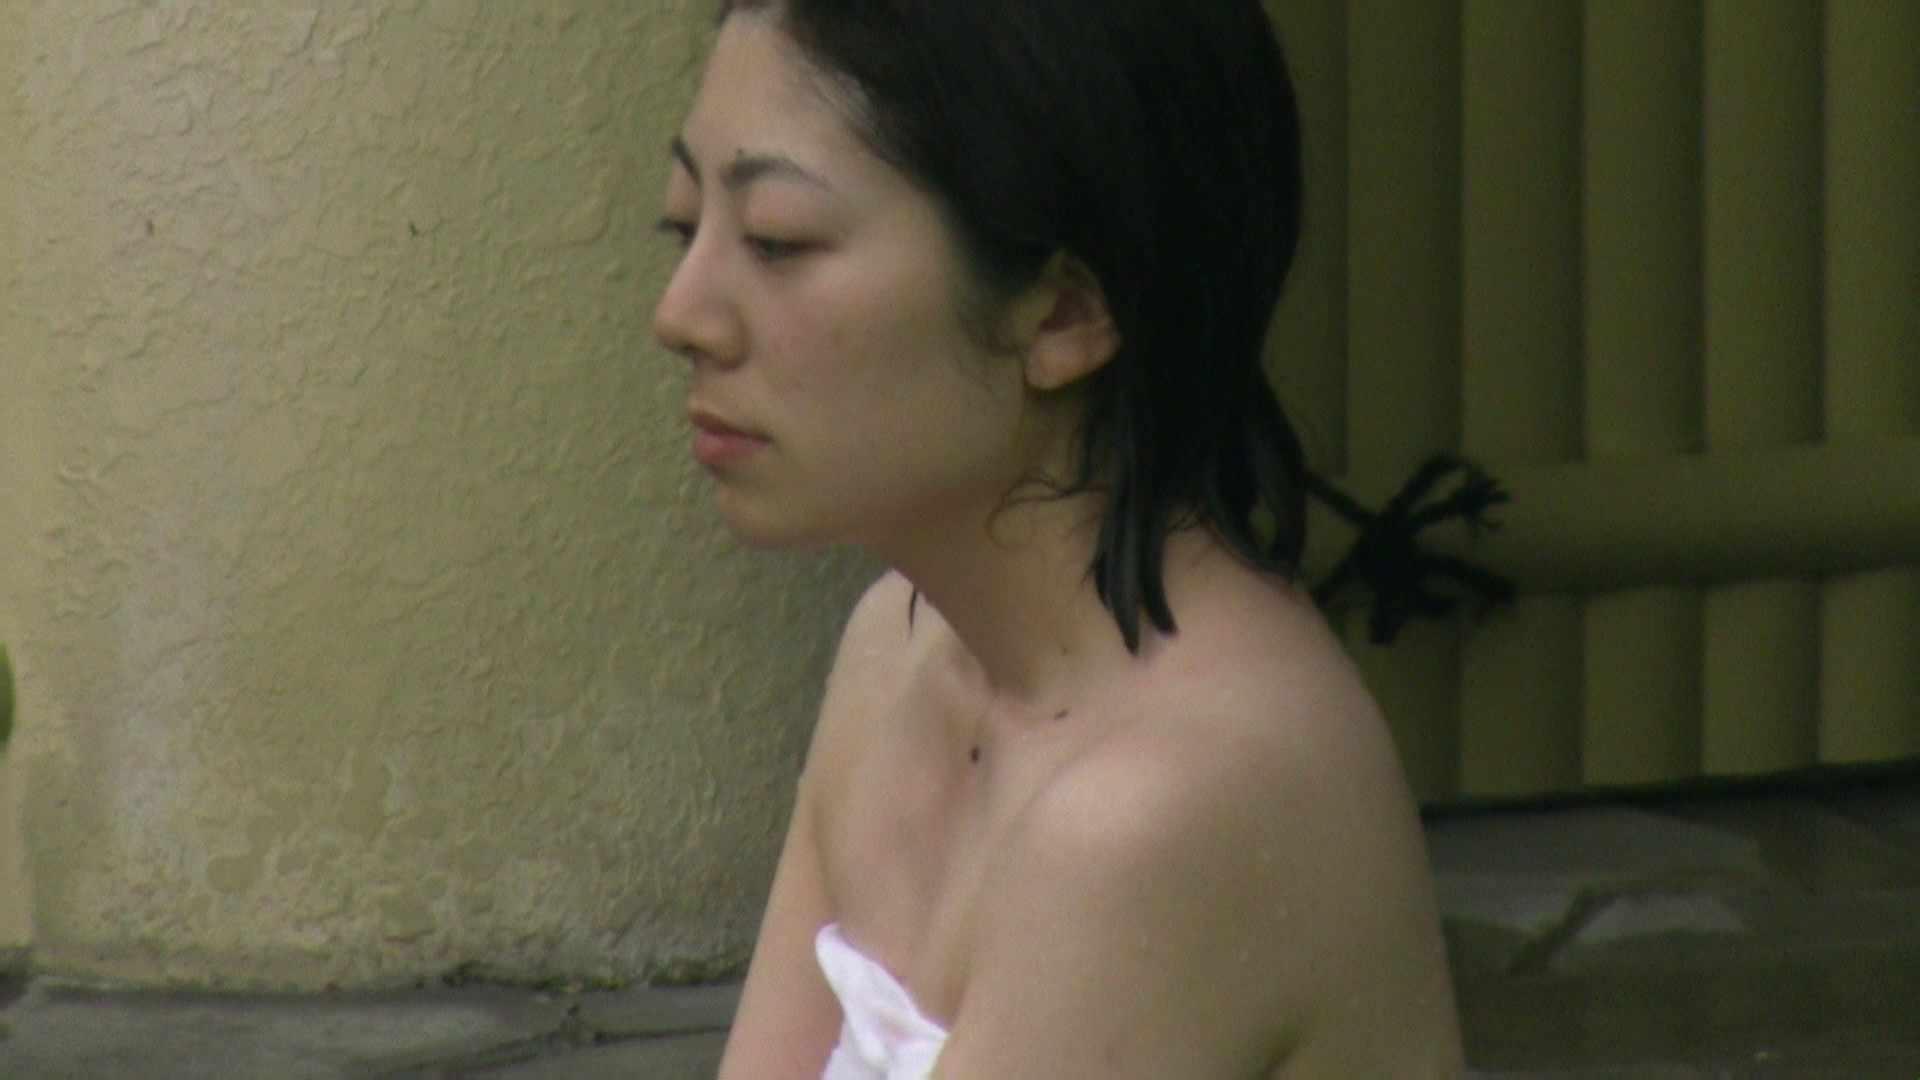 Aquaな露天風呂Vol.04 露天風呂編  94PIX 44